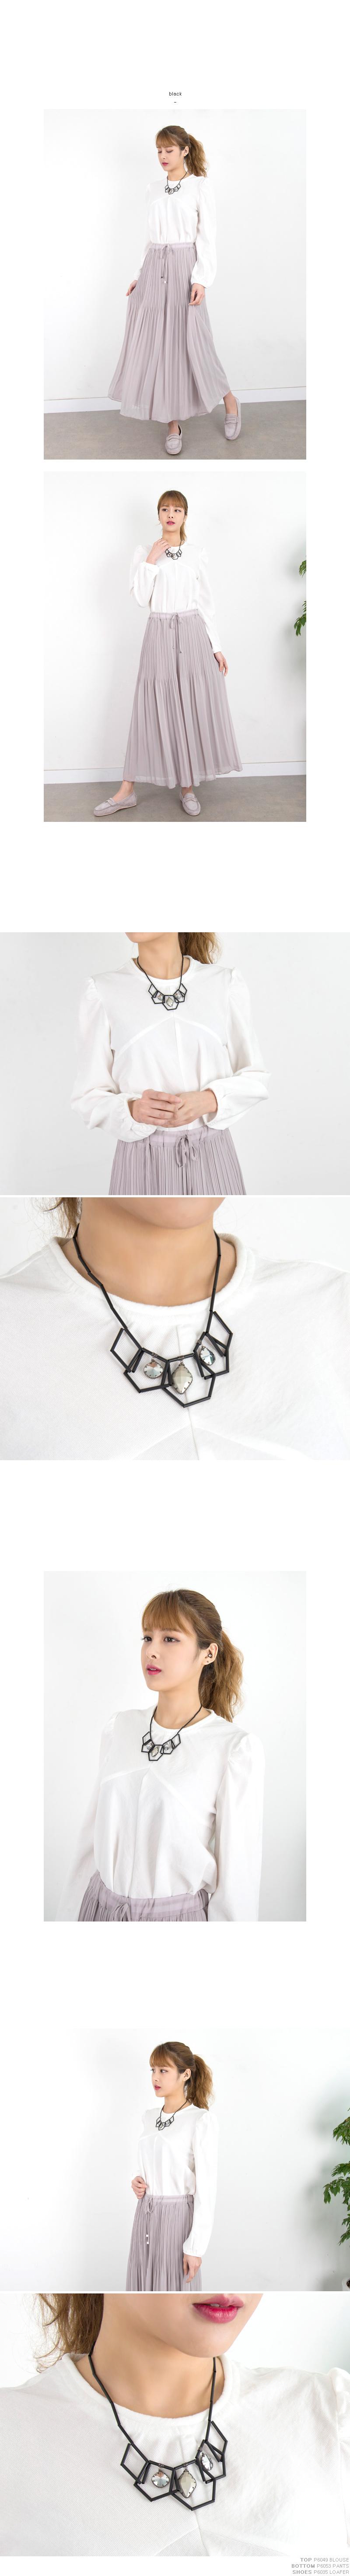 P6023 유니크 스트롱 큐빅 목걸이(케이스포함) - 쿠키세븐, 35,040원, 패션, 패션목걸이